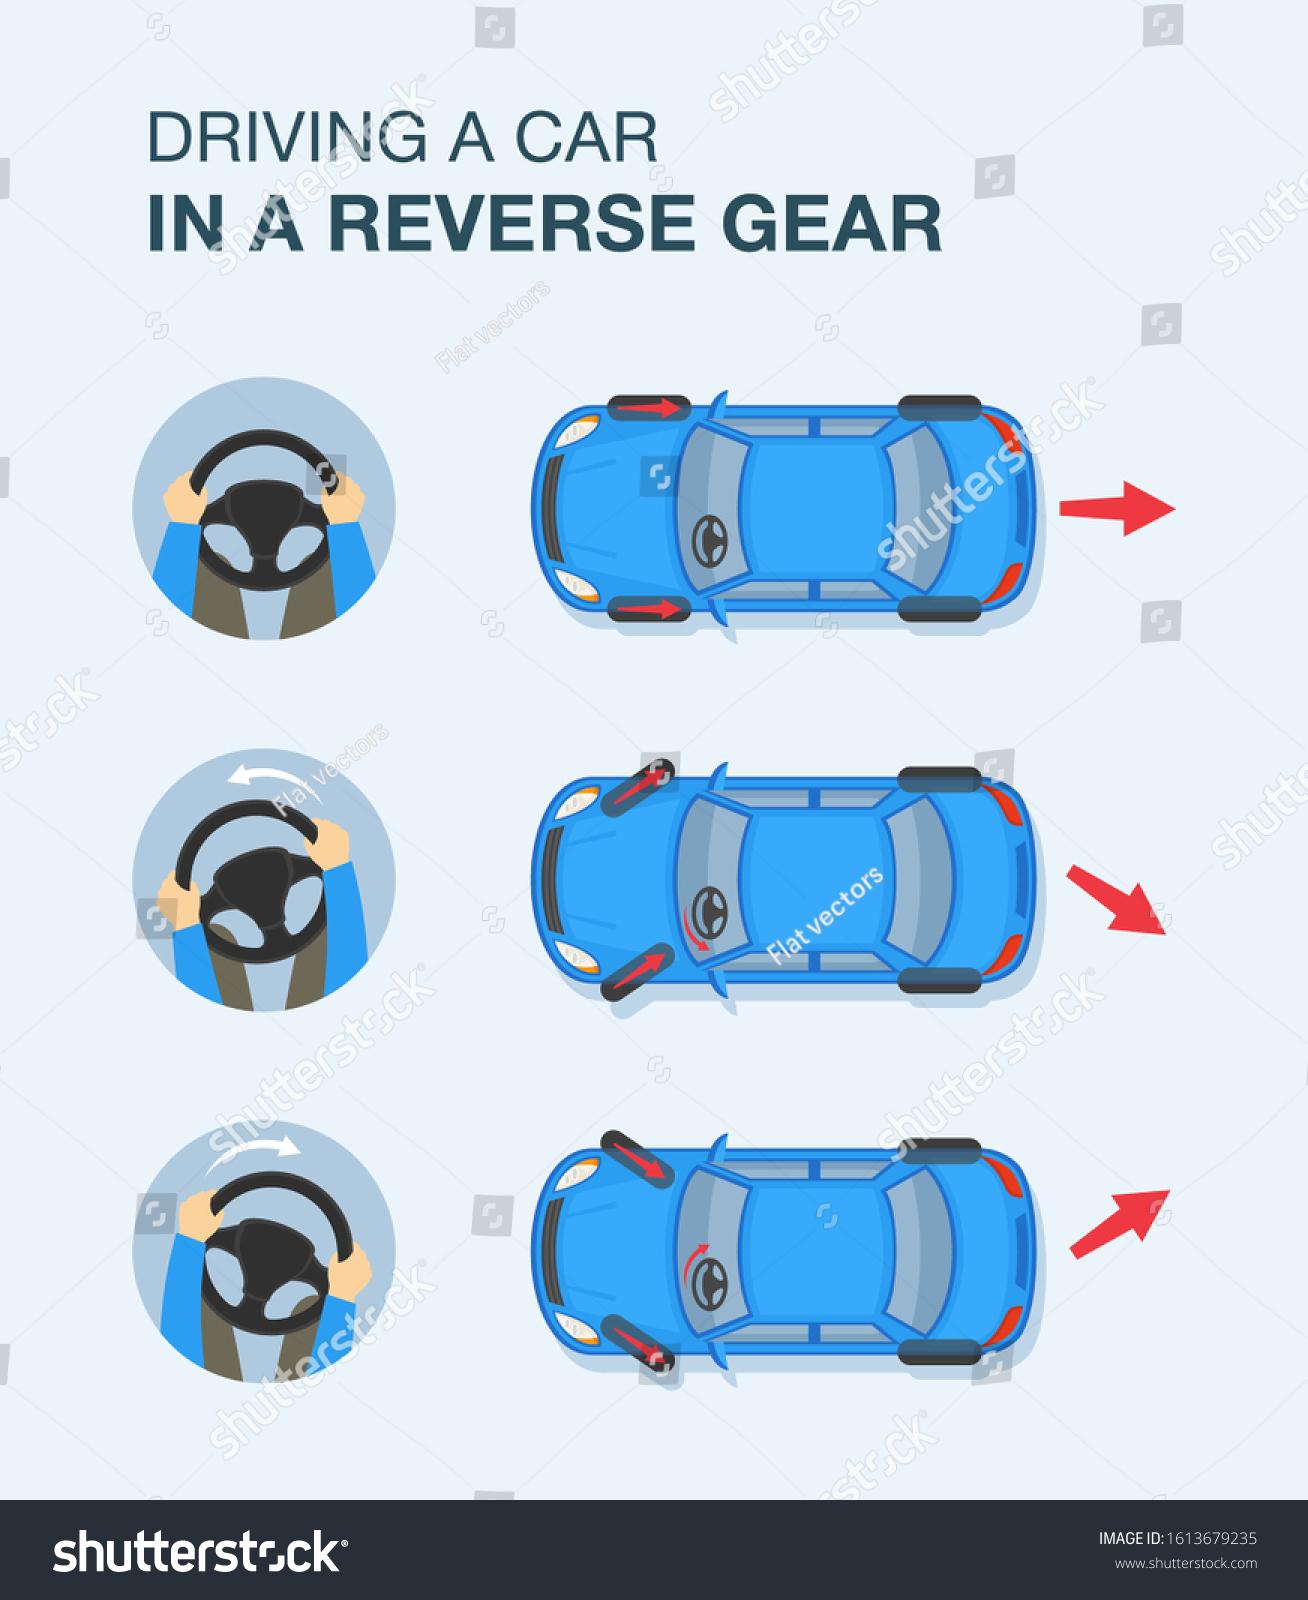 Driving Car Reverse Gear Steering Wheel Stock Vector Royalty Free 1613679235